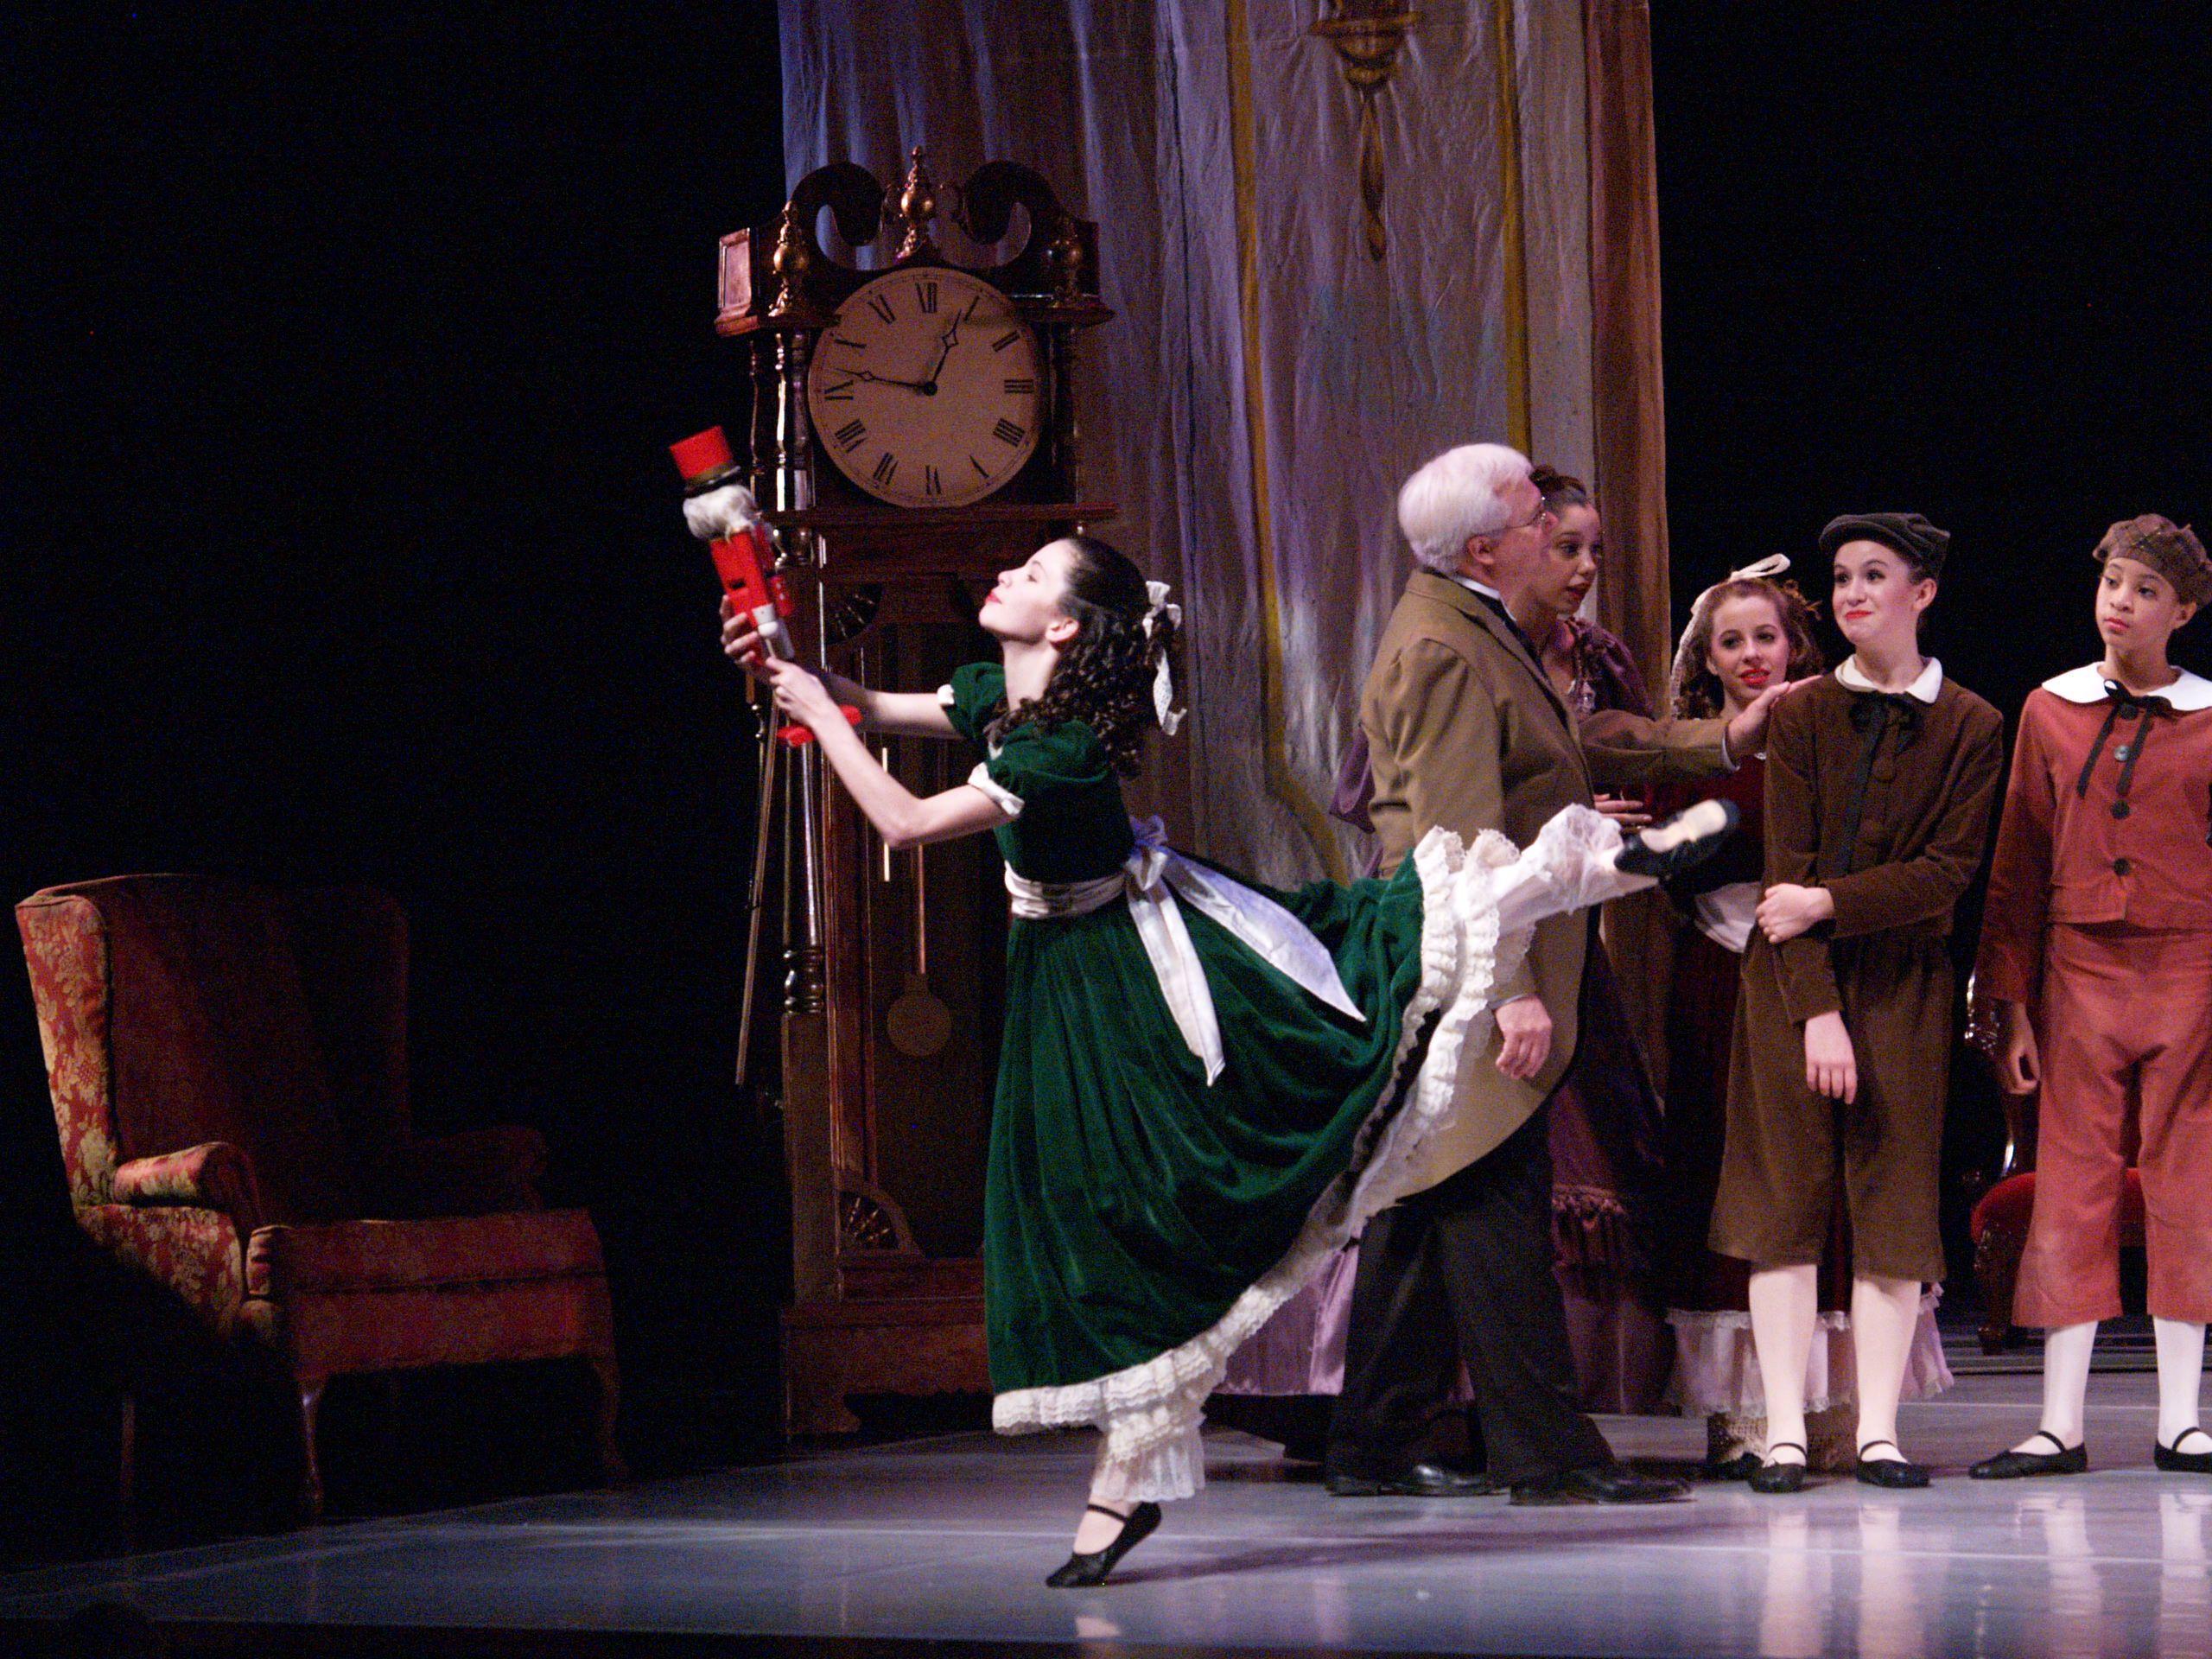 nutcracker ballet | Performances @ Lilburn School of BalletLilburn School of Ballet